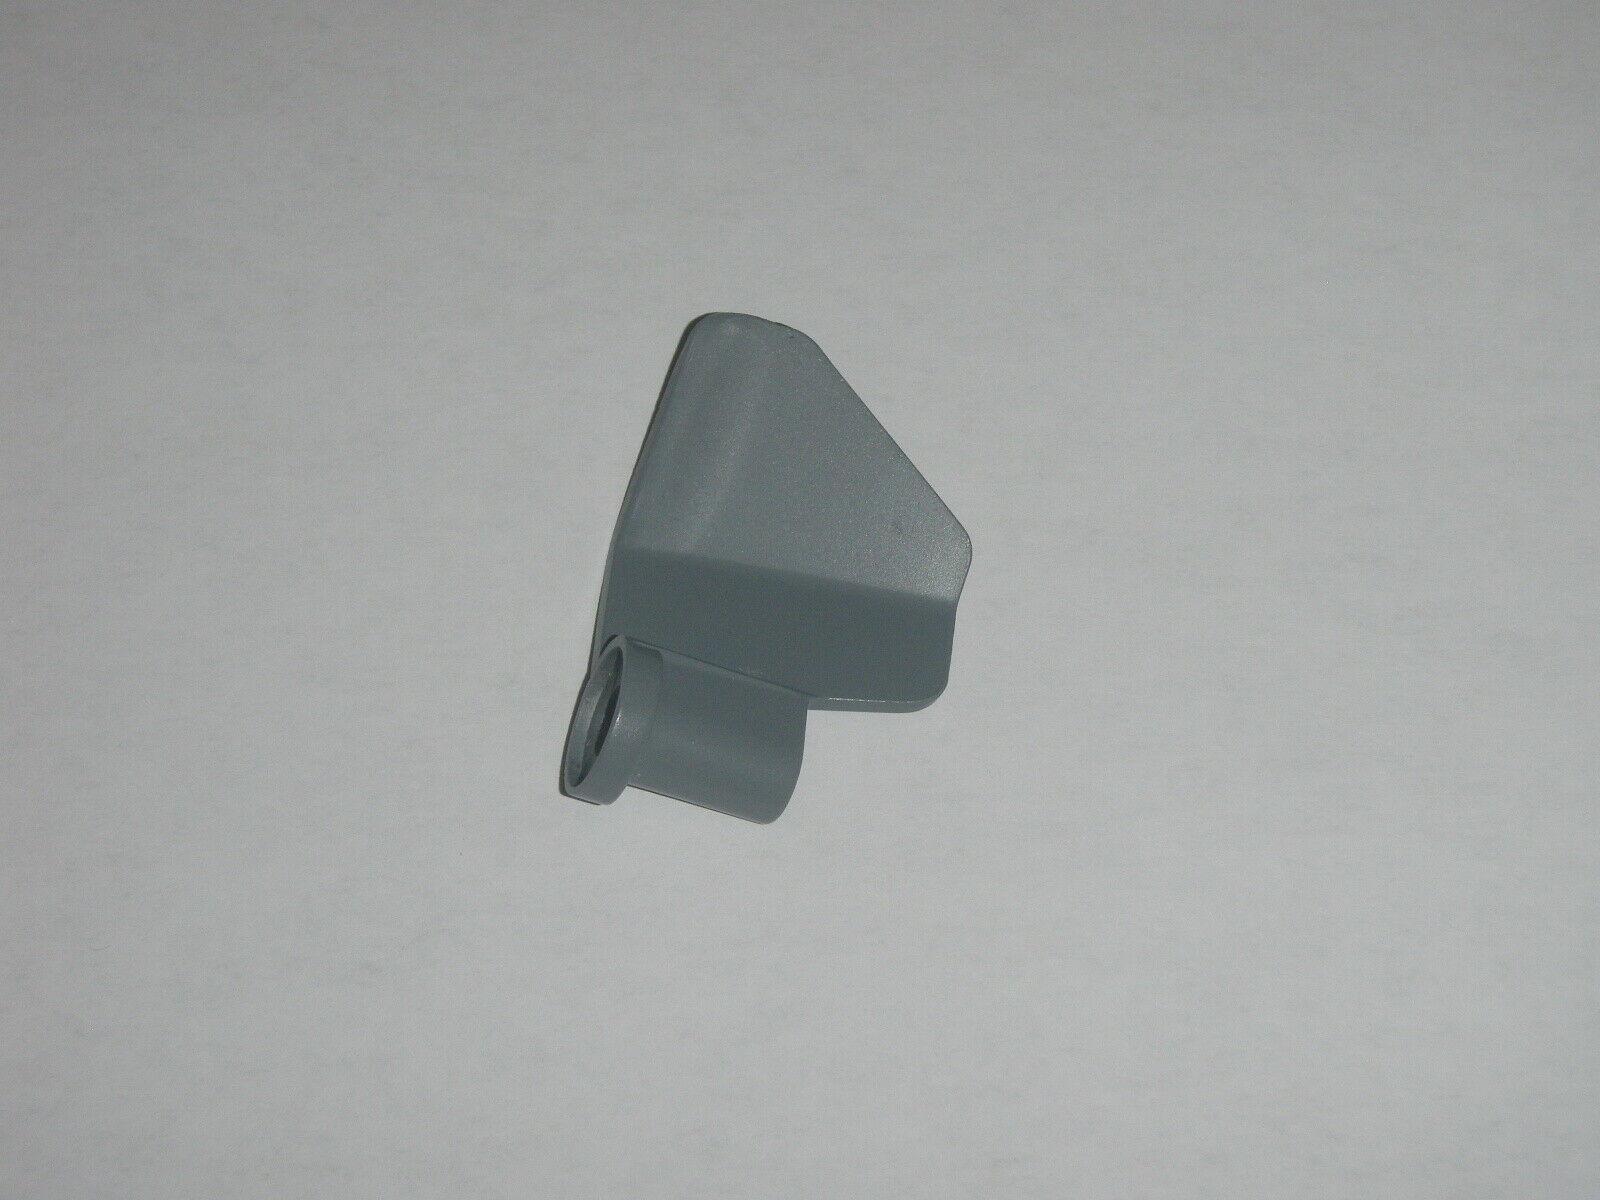 Farberware Bread Maker Machine Original Paddle for Models FTR700 (OEM) FTR700DL image 6